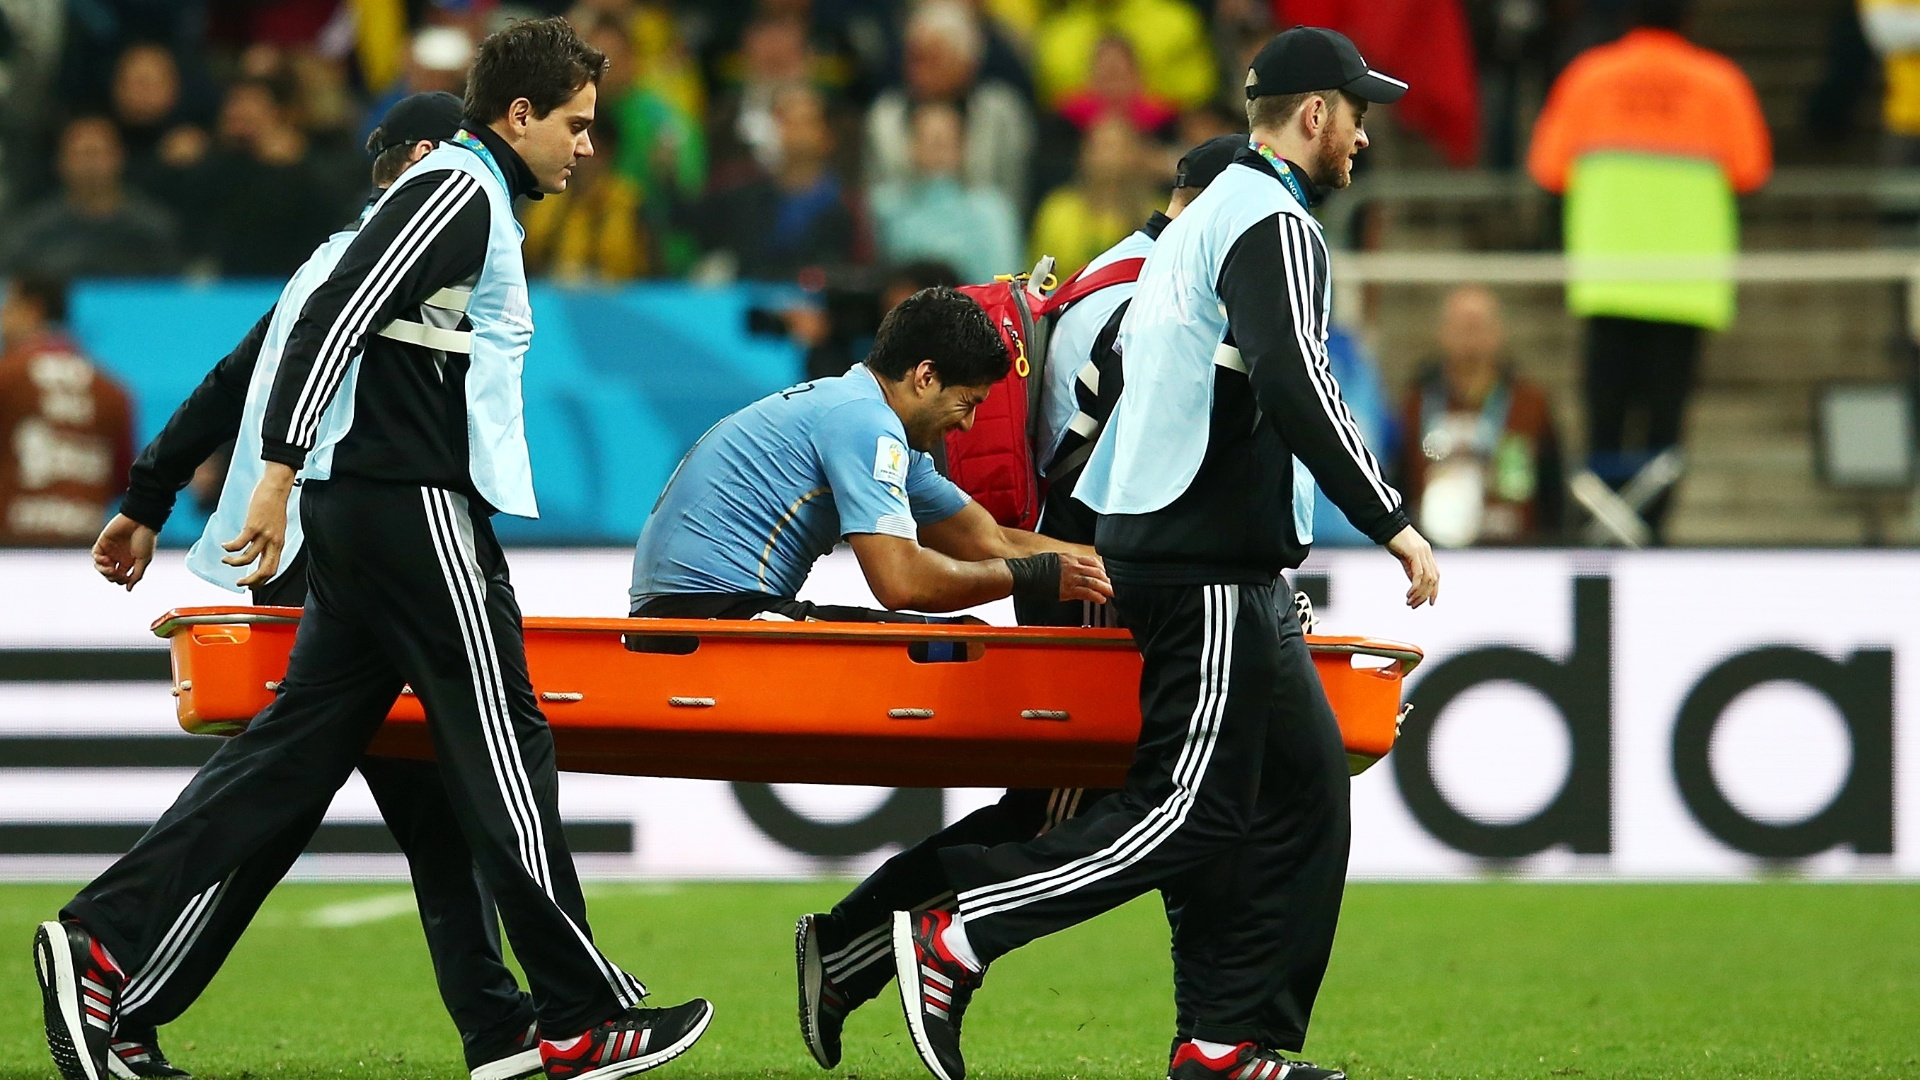 19.jun.2014 - Luis Suárez deixa o gramado de maca durante a vitória uruguaia. O atacante marcou os dois gols contra a Inglaterra